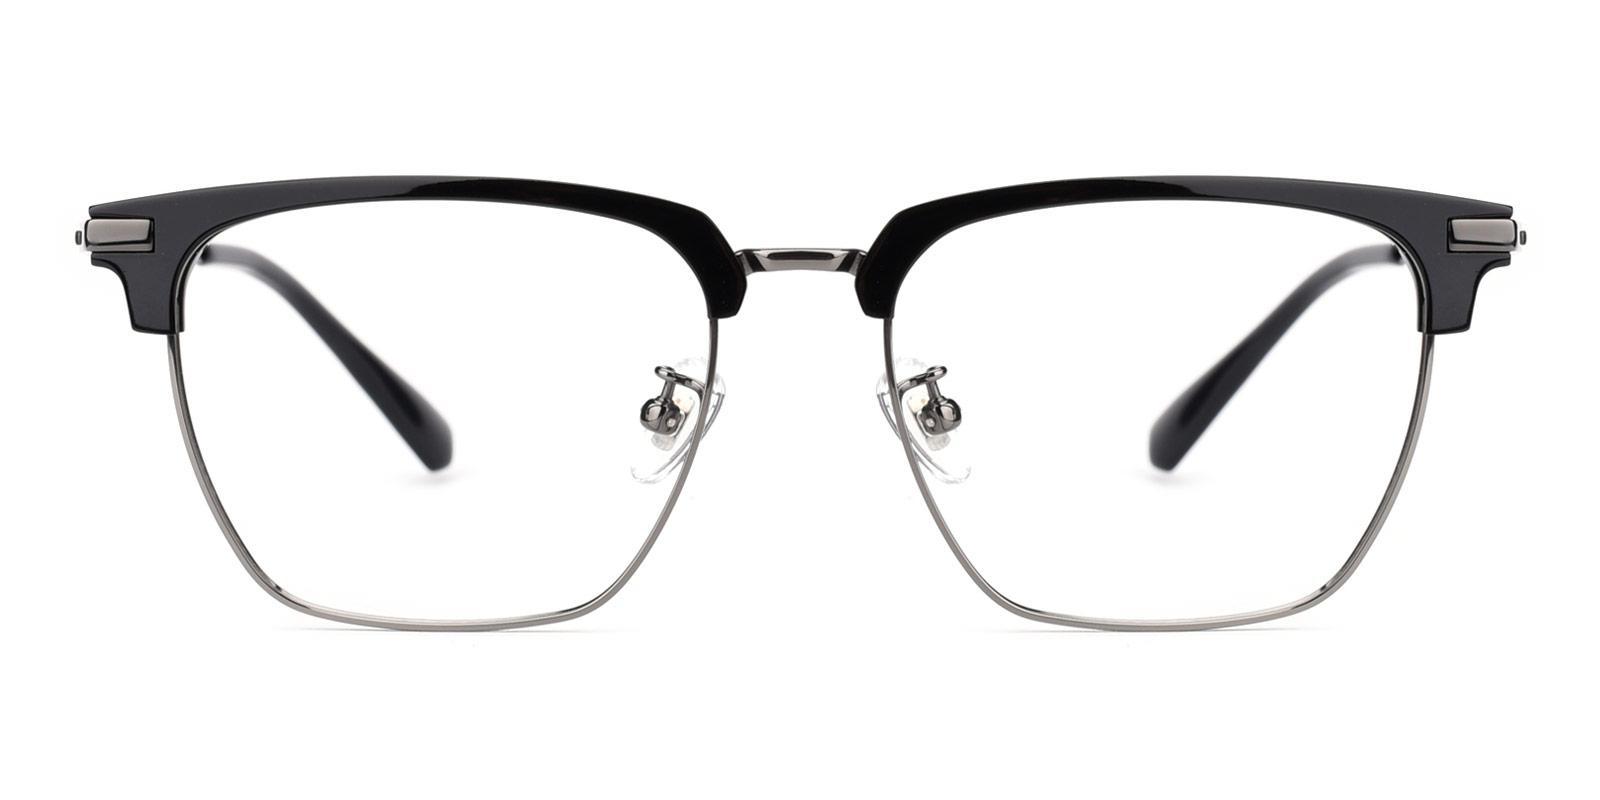 Signage-Gun-Browline / Rectangle-Titanium-Eyeglasses-detail